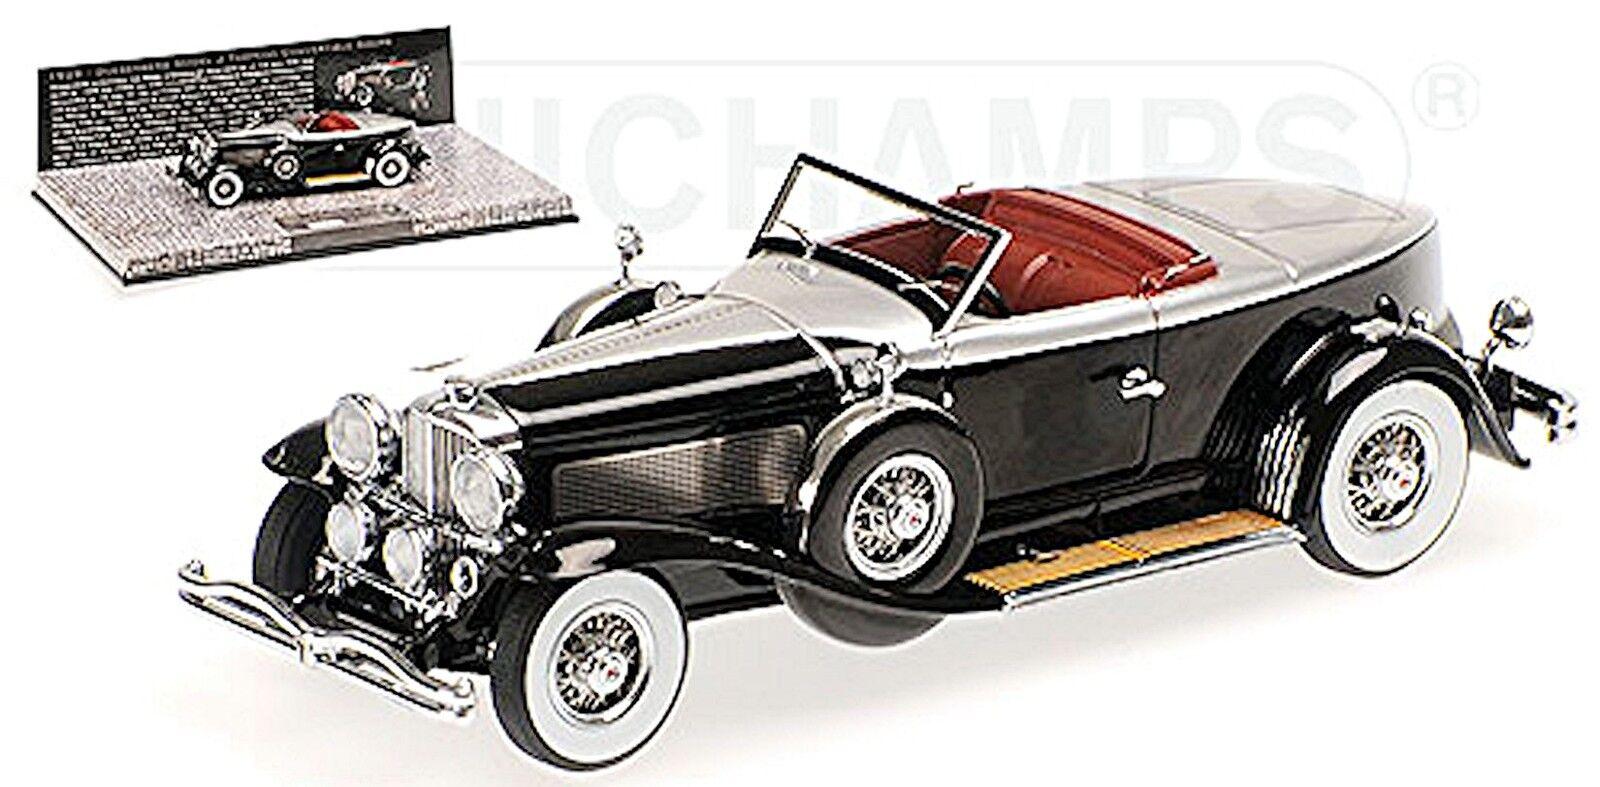 precios mas baratos Duesenberg modelo j torpedo converdeible coupe 1929 negro plata 1 1 1 43 Minichamps  el más barato